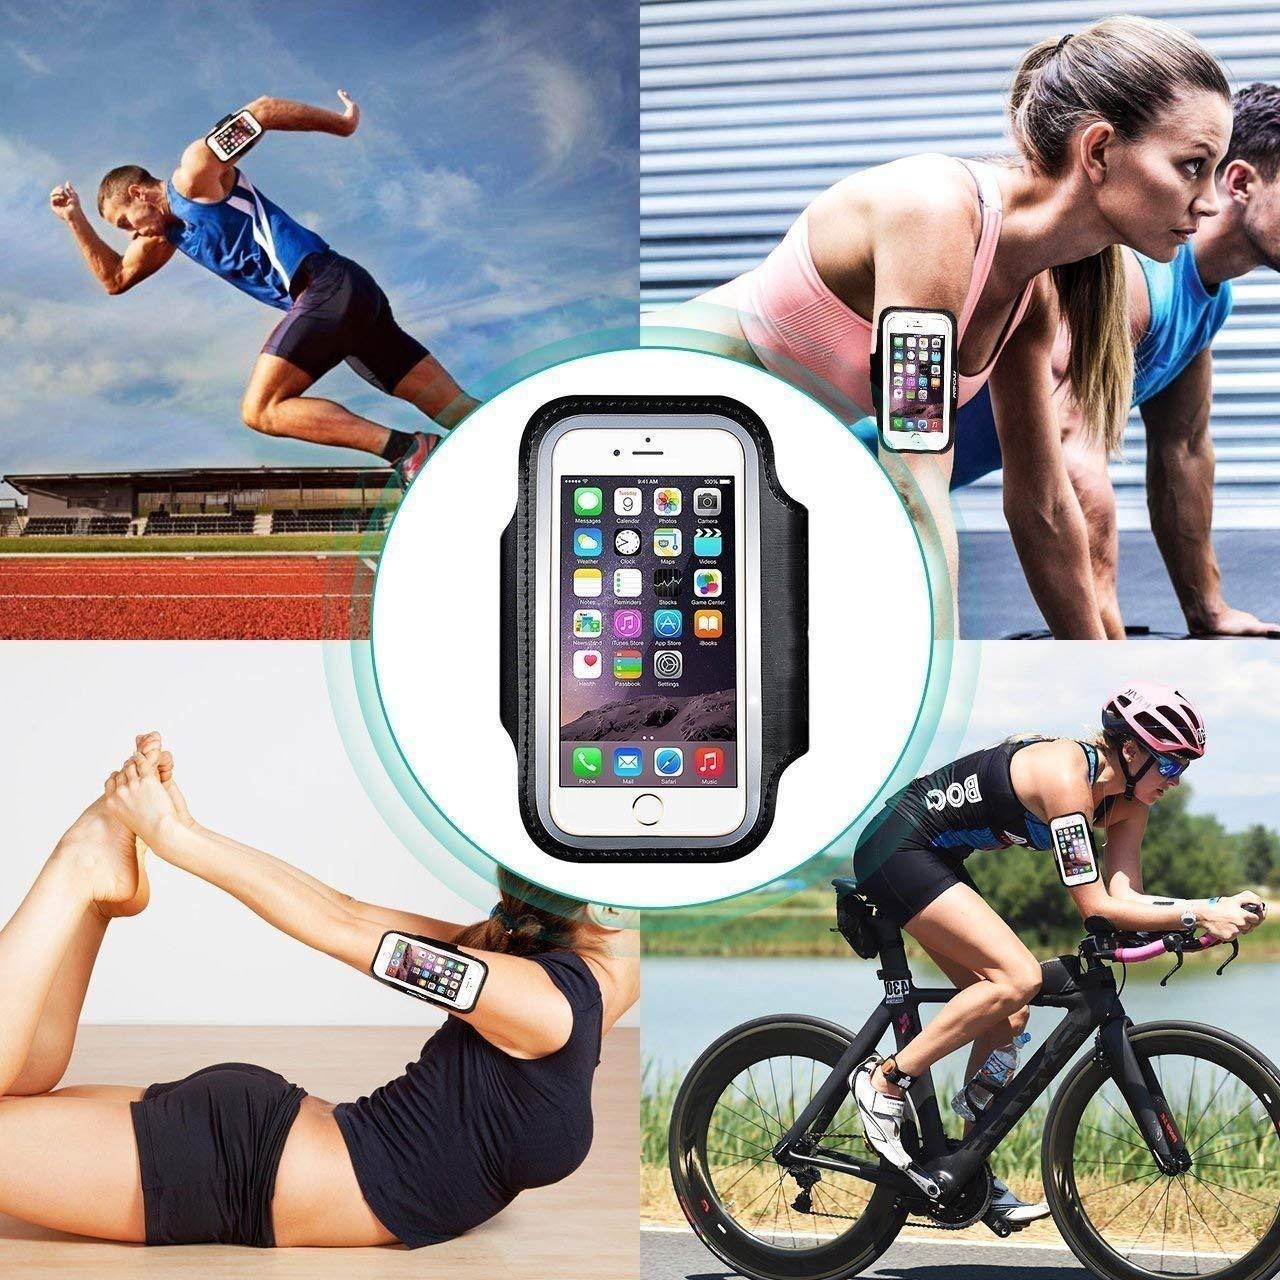 ideal para fitness senderismo ciclismo. multifunci/ón brazalete deportivo para Xiaomi Redmi Note 6 Pro Brazalete deportivo gimnasio con tama/ño ajustable dise/ño seguro correr